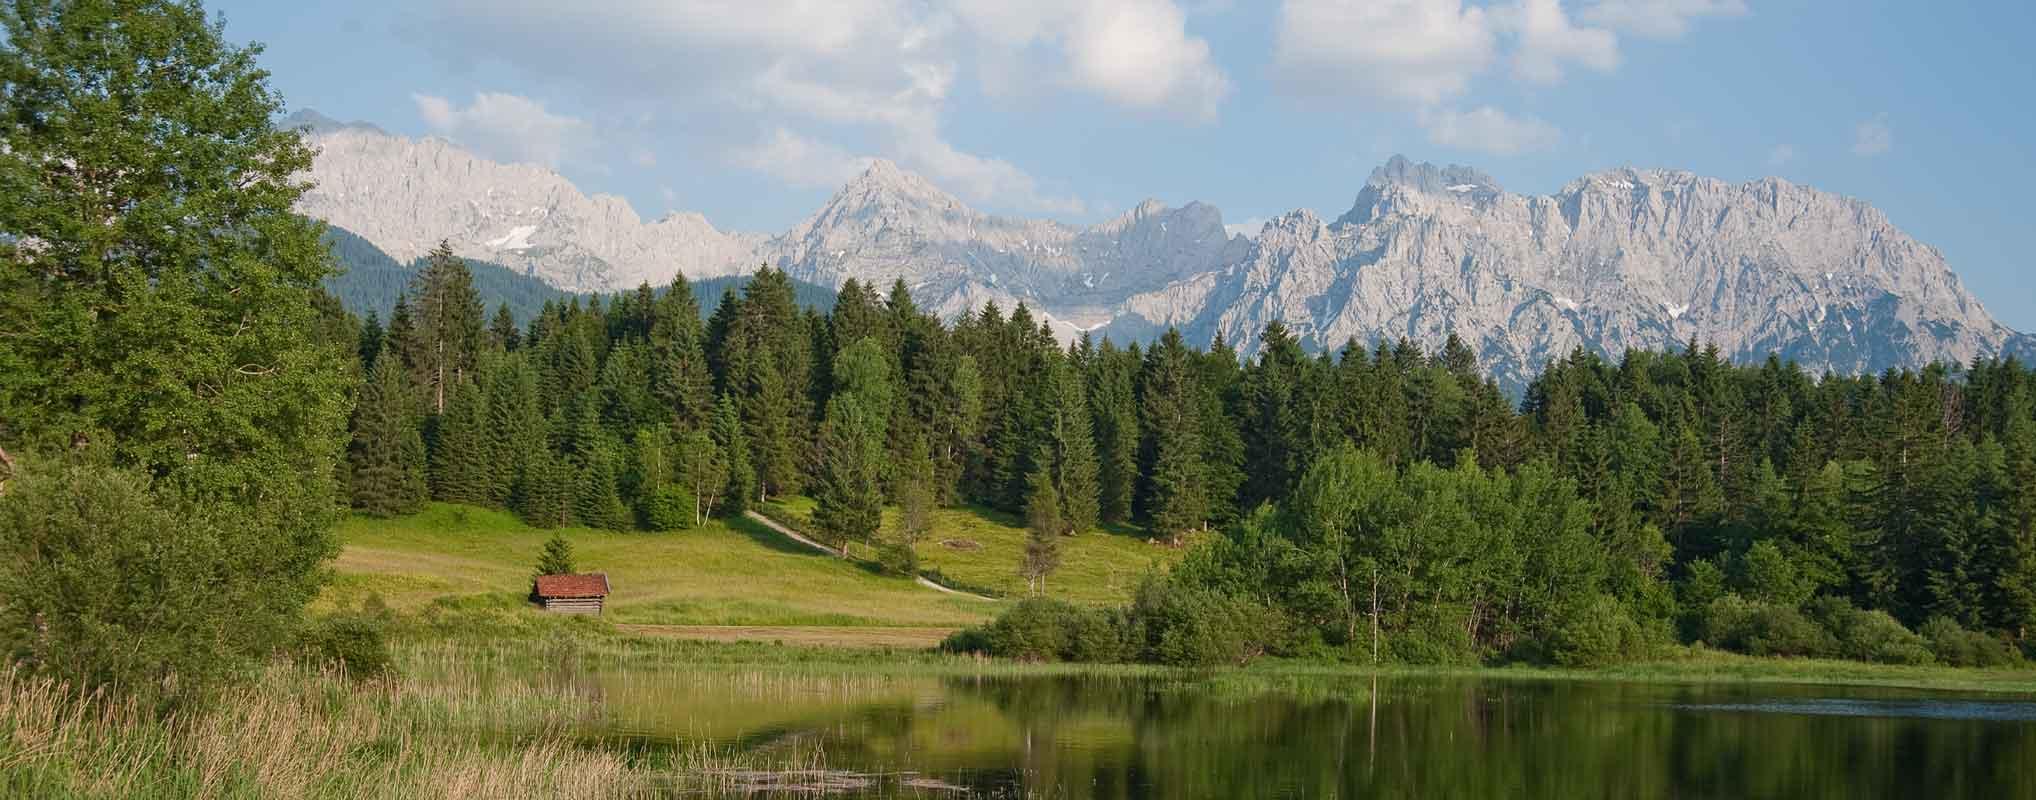 Alpen-Caravanpark-Tennsee-senioren-Bayern